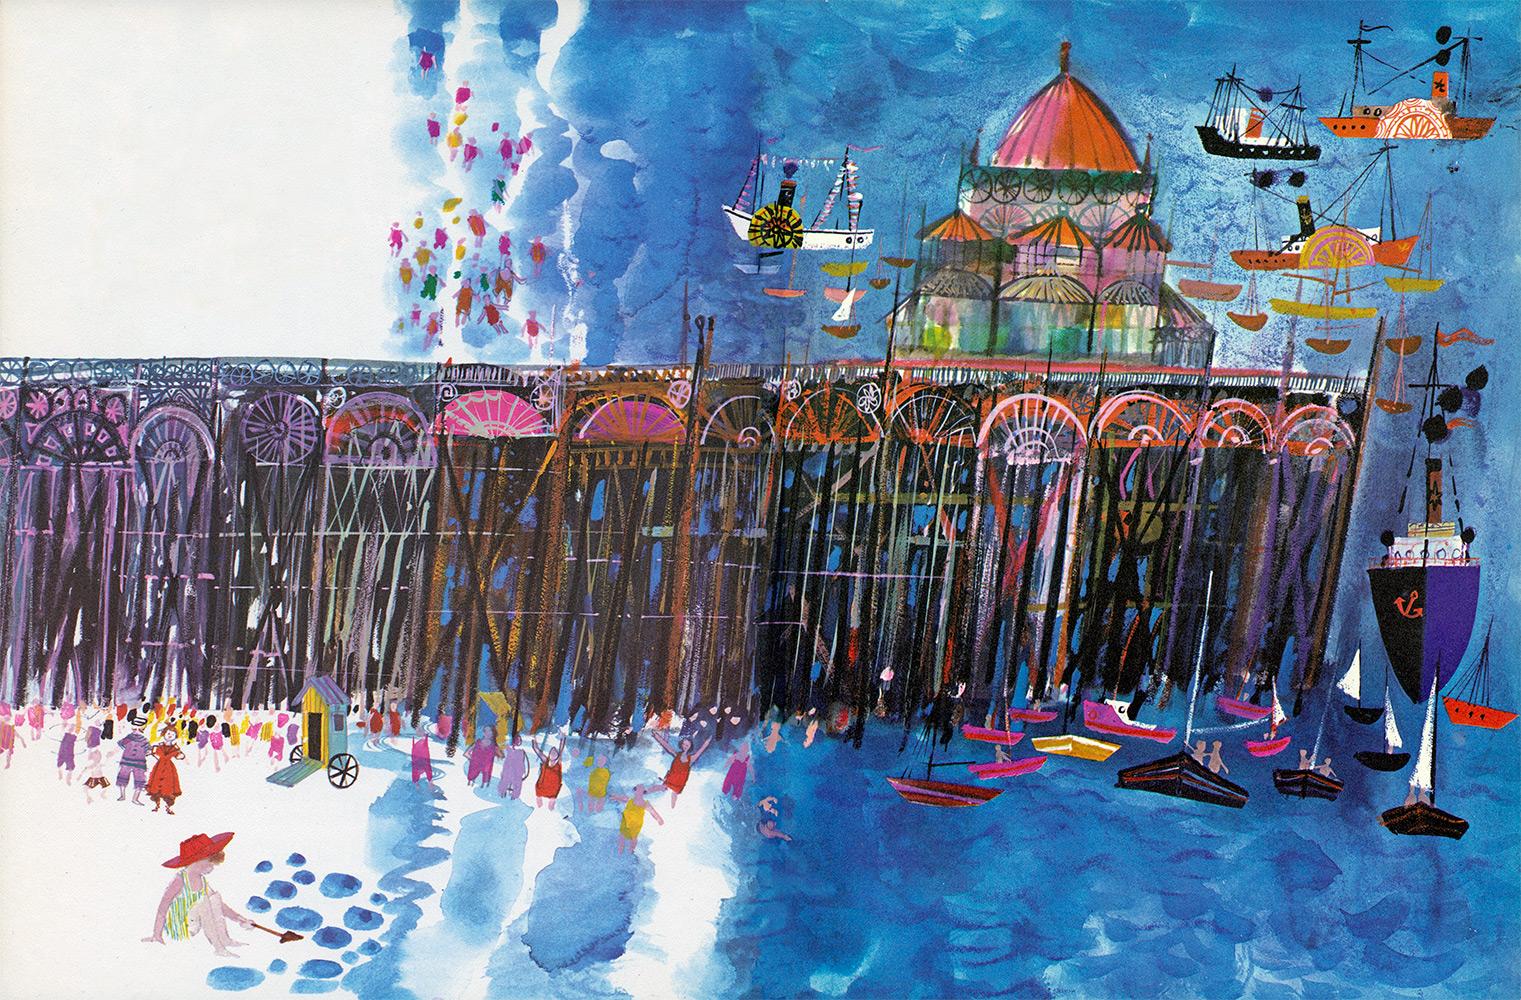 Robert-Louis-Stevenson-At-the-Seaside-from-a-childs-garden-of-verses-Brian-Wildsmith.jpg